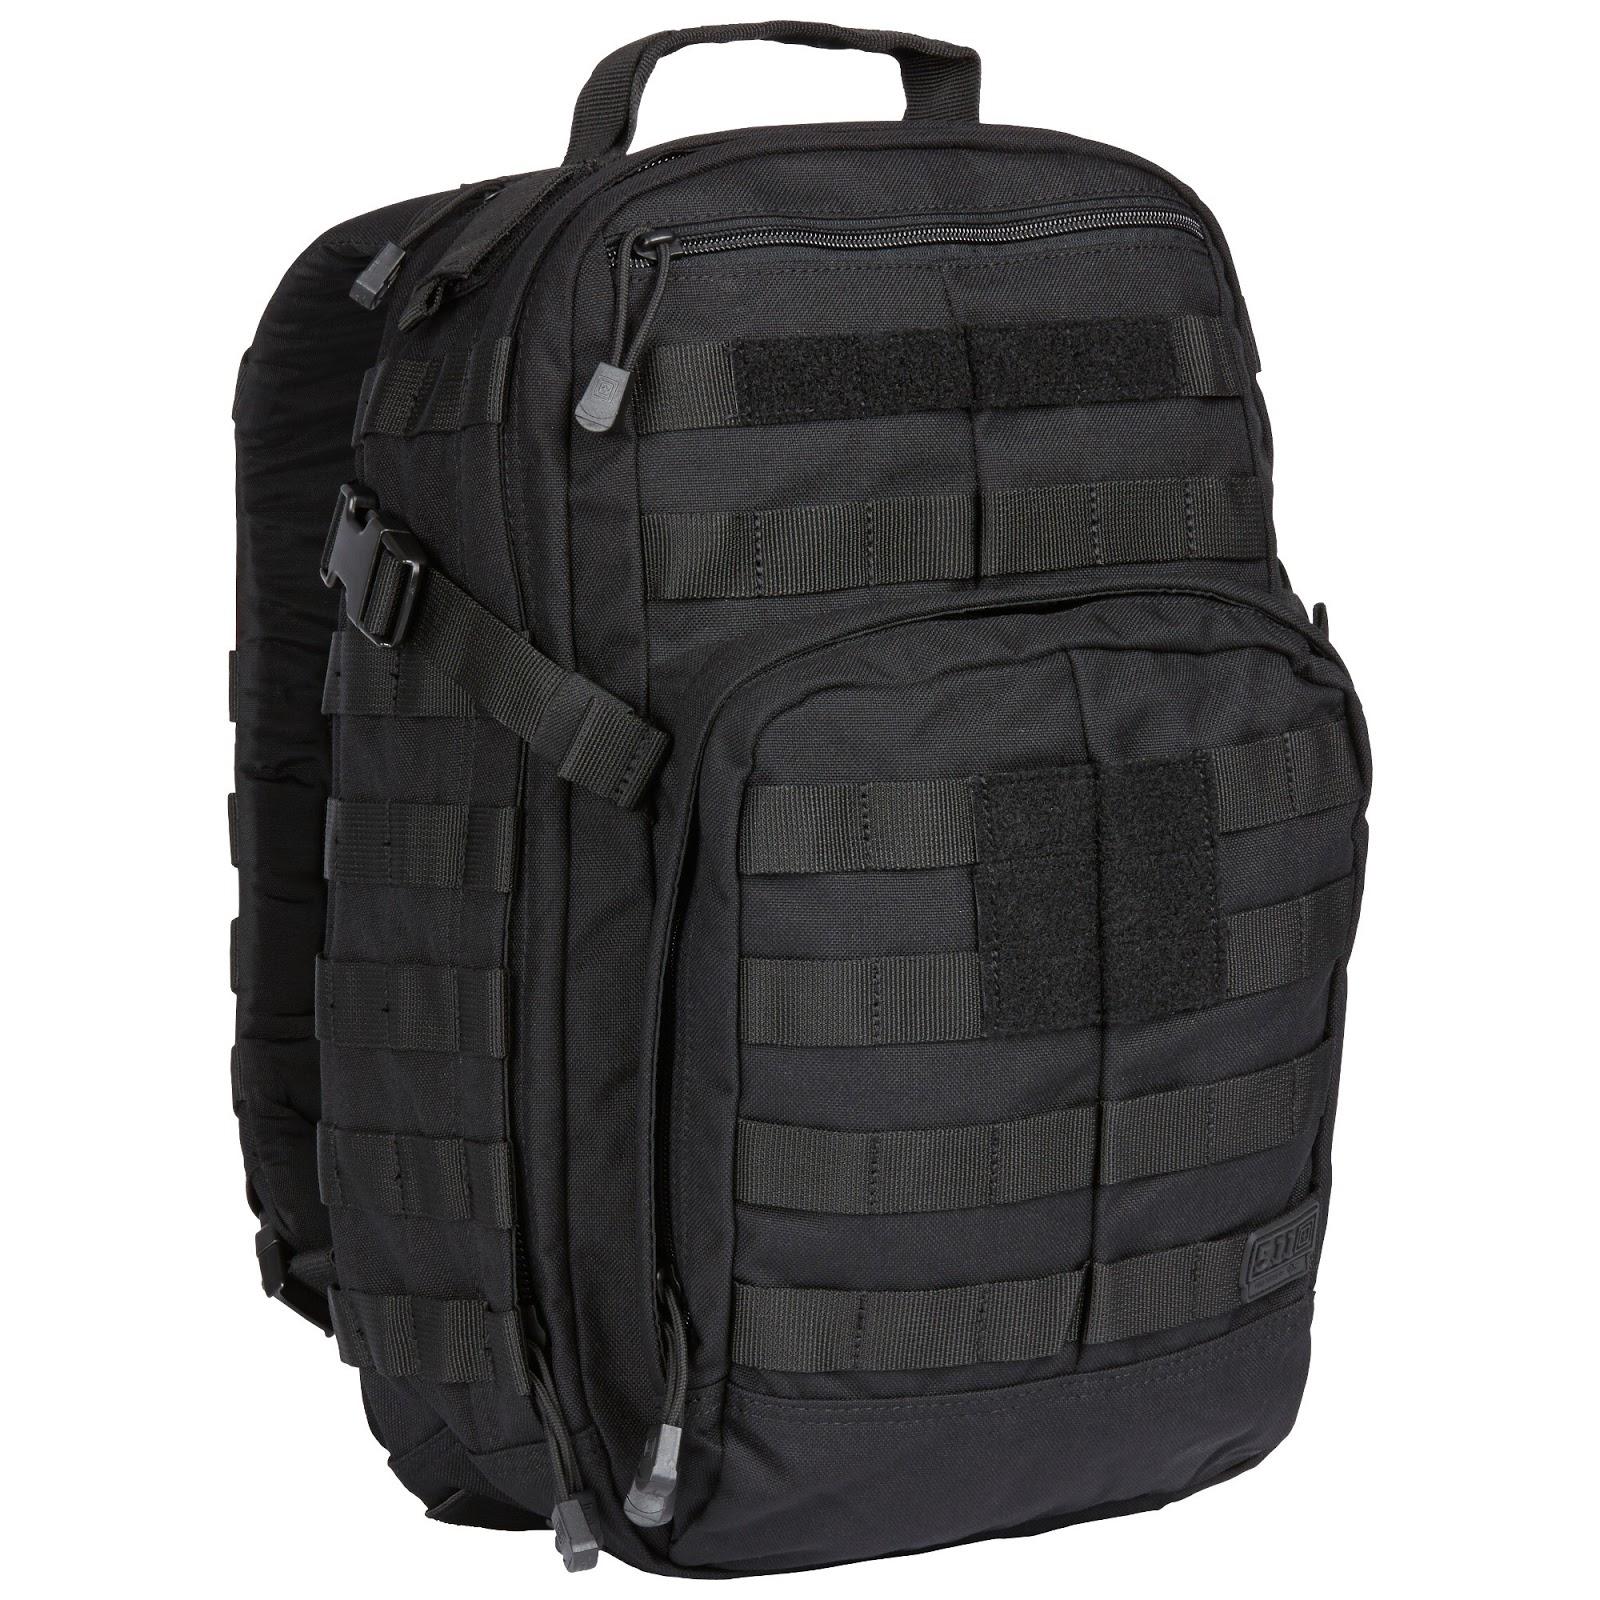 c97bceecf9 Σακίδια πλάτης 5.11 Tactical RUSH (Βίντεο)